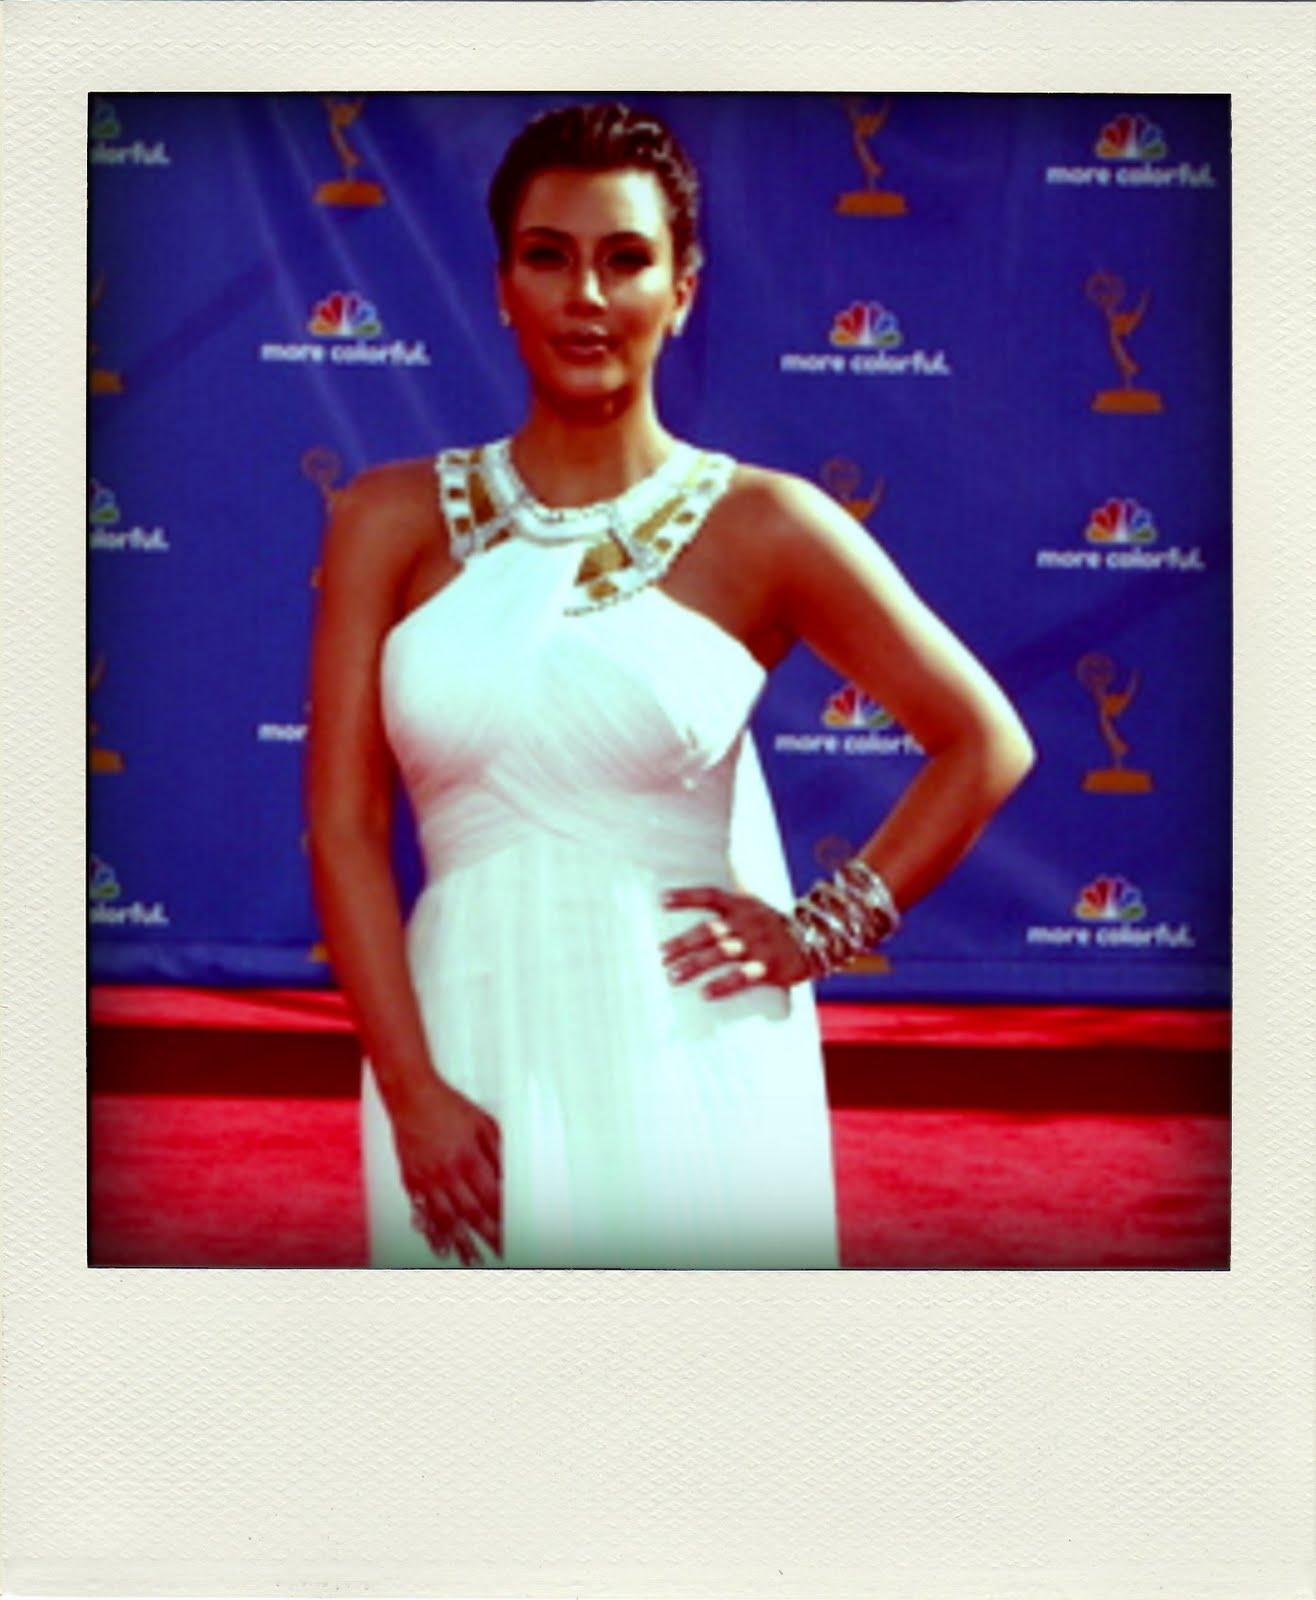 http://2.bp.blogspot.com/_0OABEPOmeKY/THta9jP-WZI/AAAAAAAAAKI/-5PuWsD4w2o/s1600/Kim_Kardashian_29Aug2010_PR-pola03.jpg